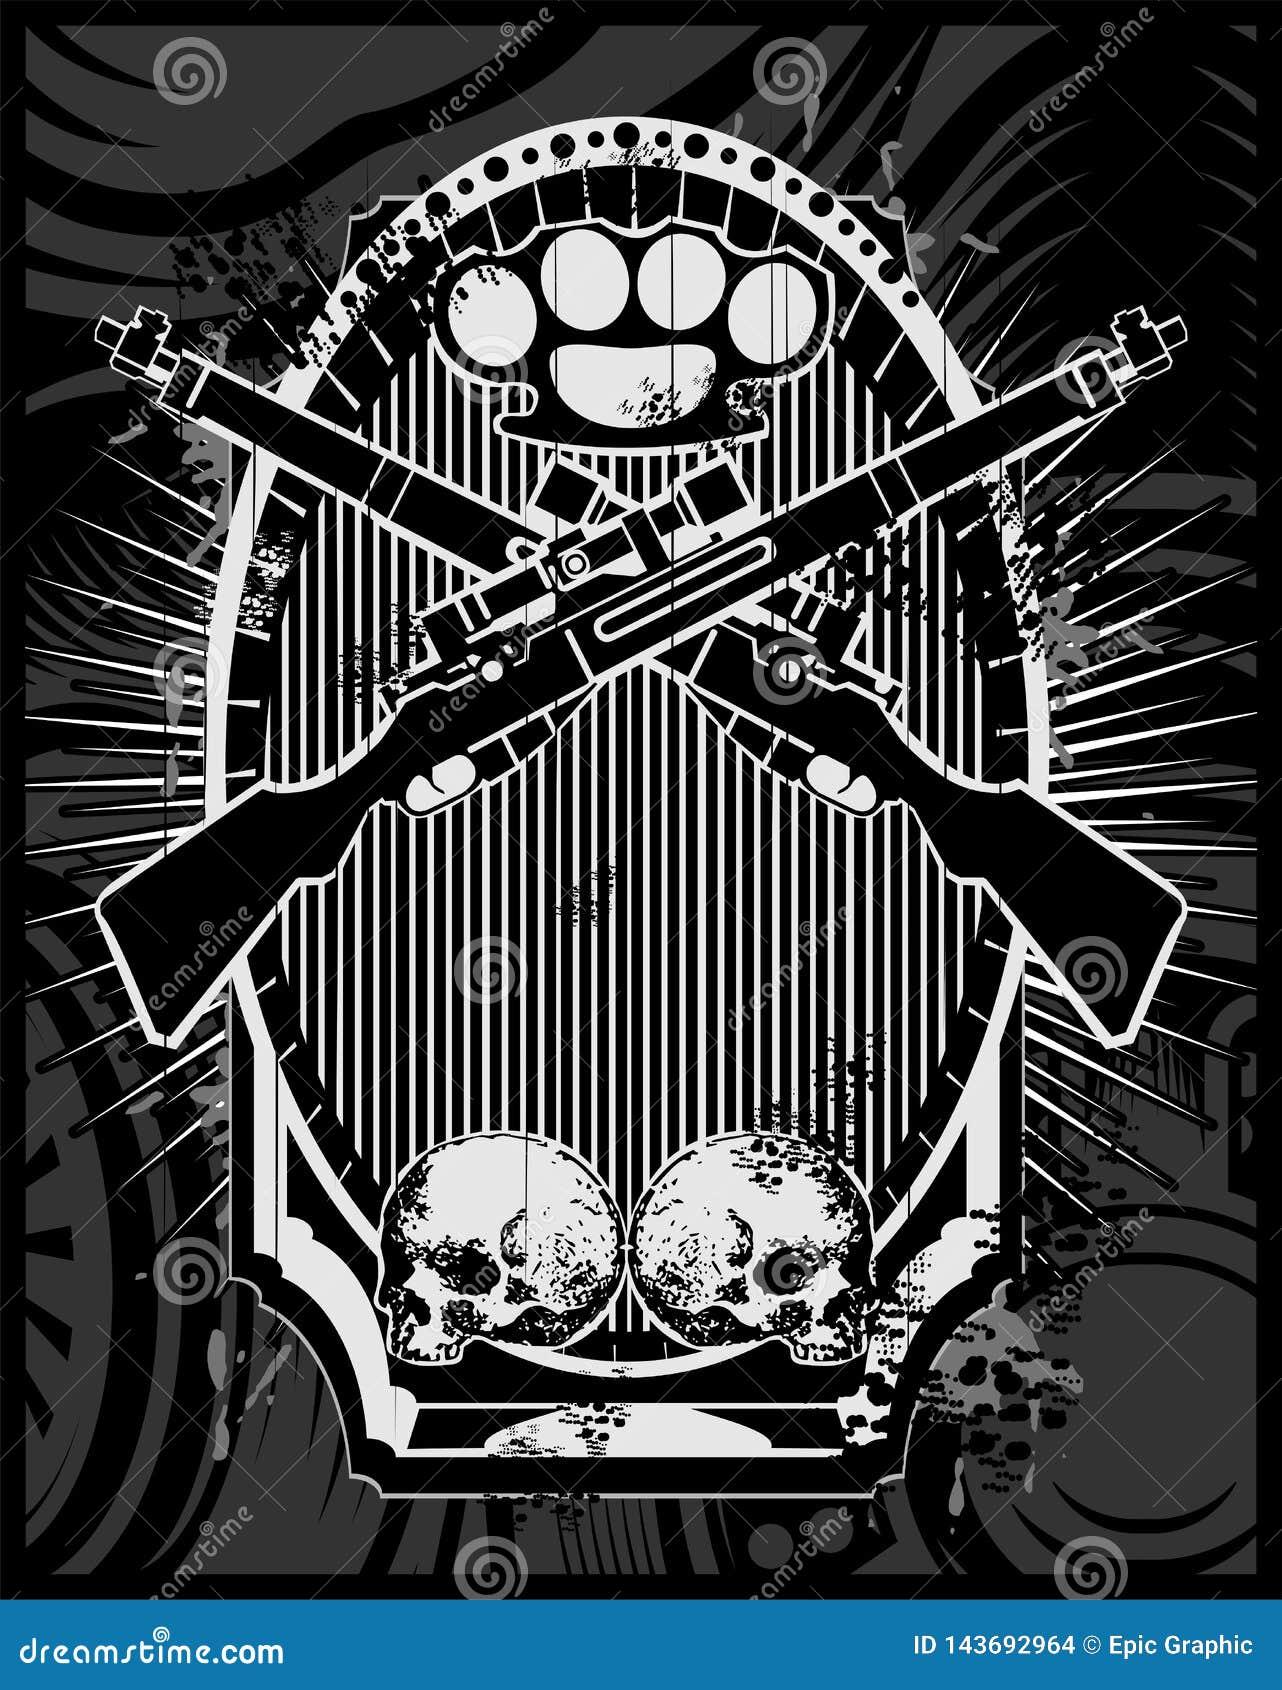 Vetor da arma, da arma, da junta e do crânio